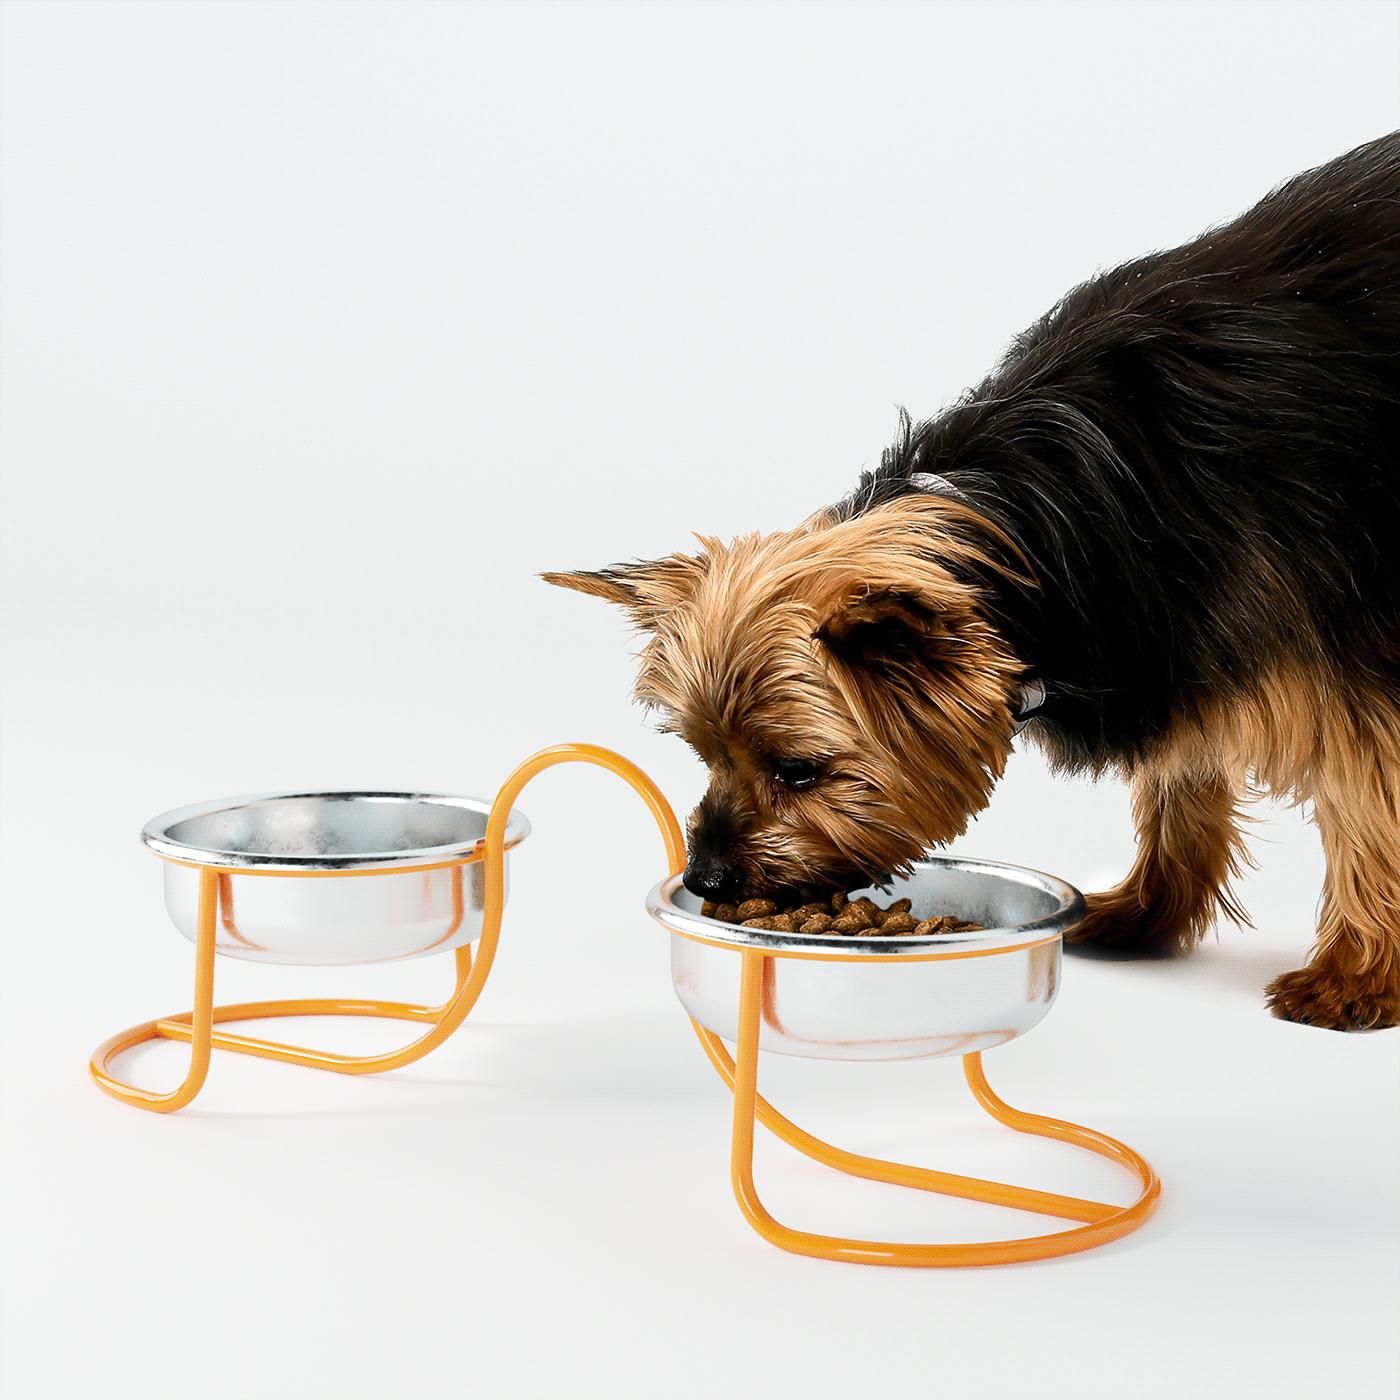 animals,bowl,design,dogs,hamitsaev,home,metal,Pet